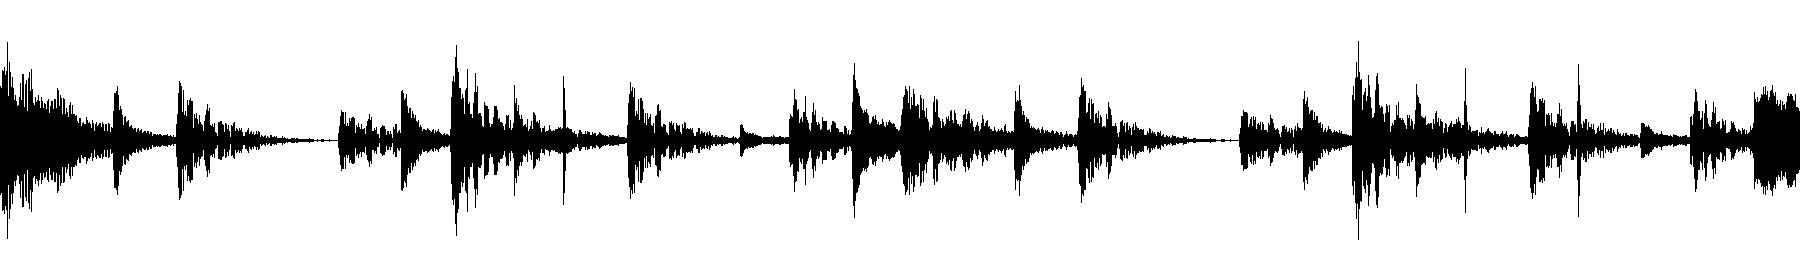 g abs05 085